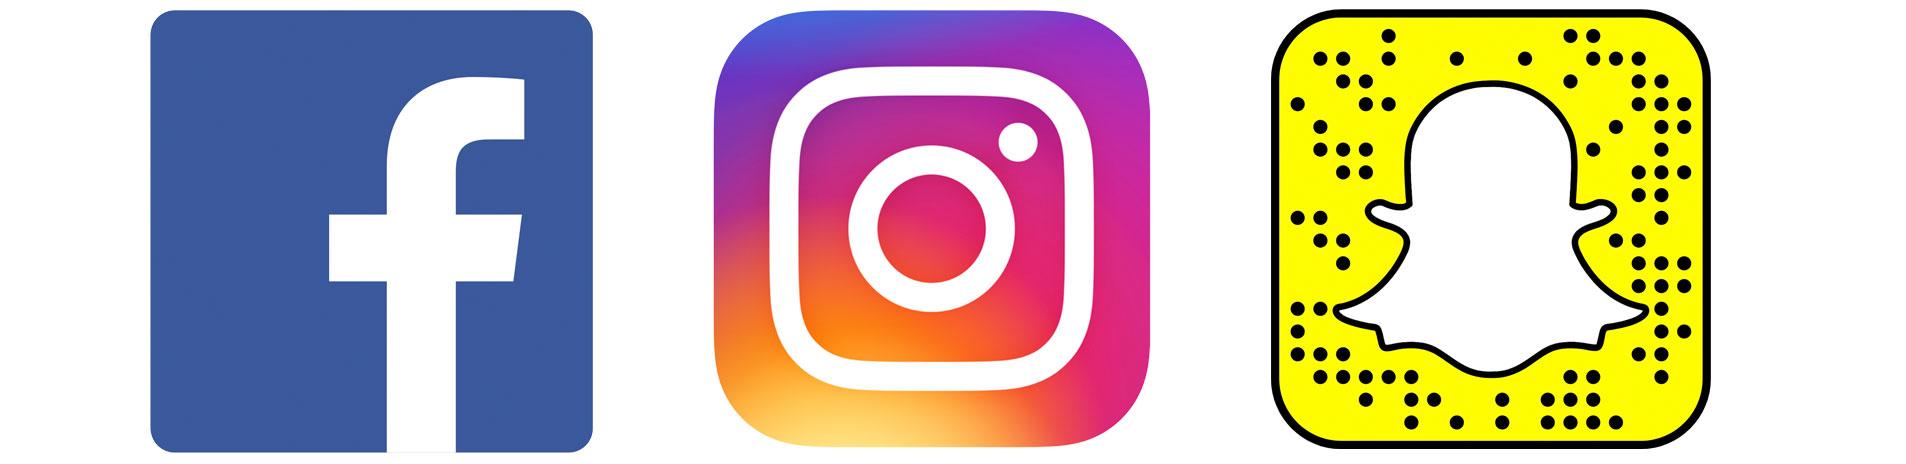 Social Platform AR - Snapchat Lenses and Facebook Filters